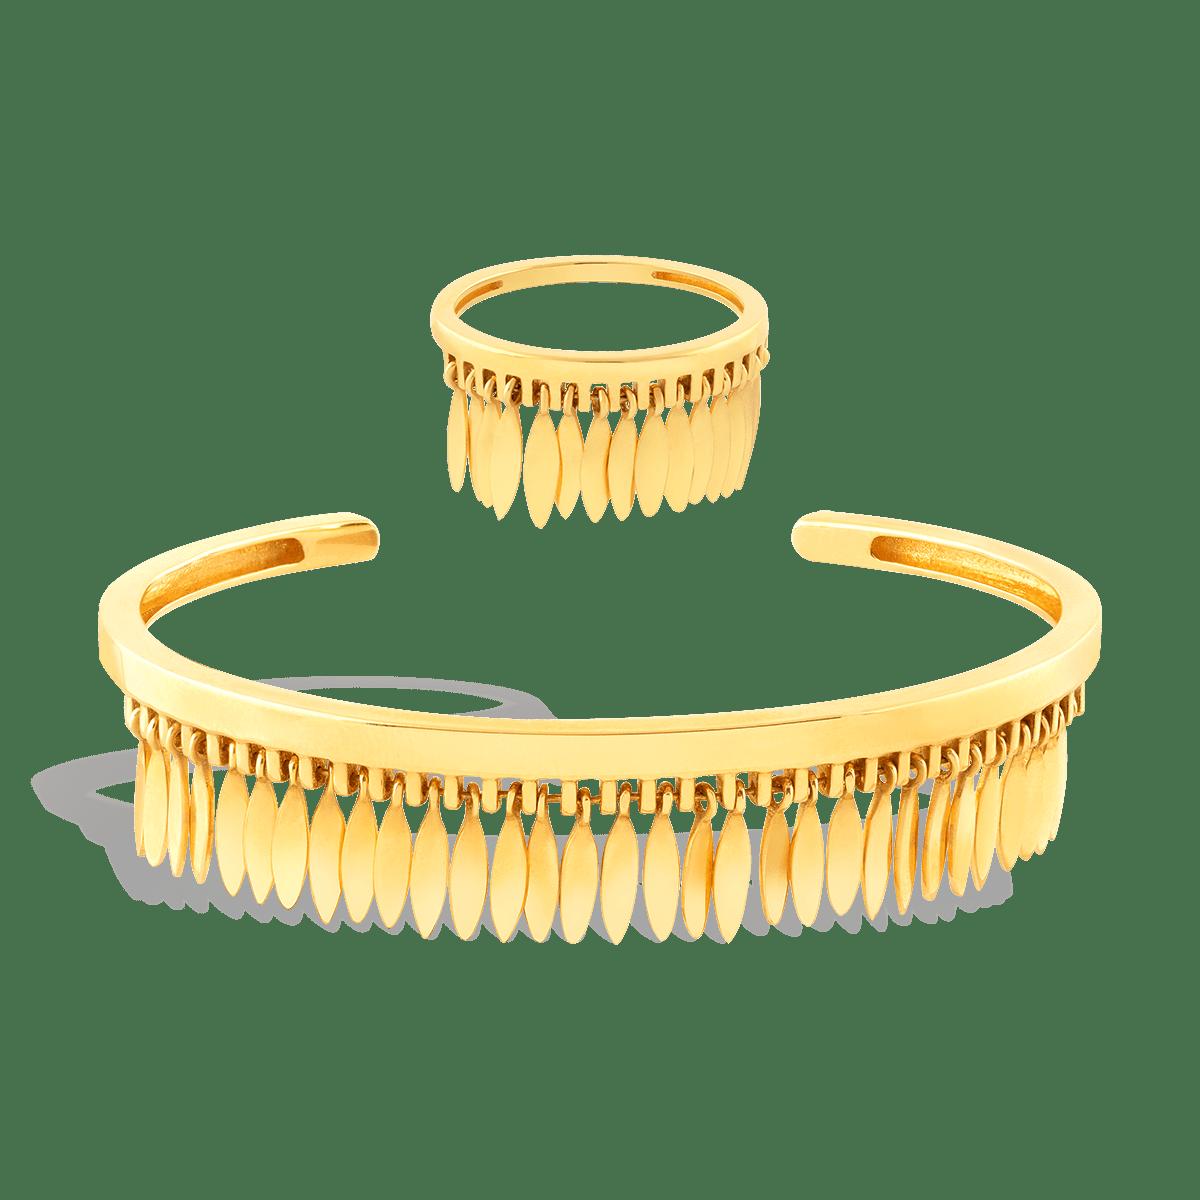 انگشتر طلا آپاچی